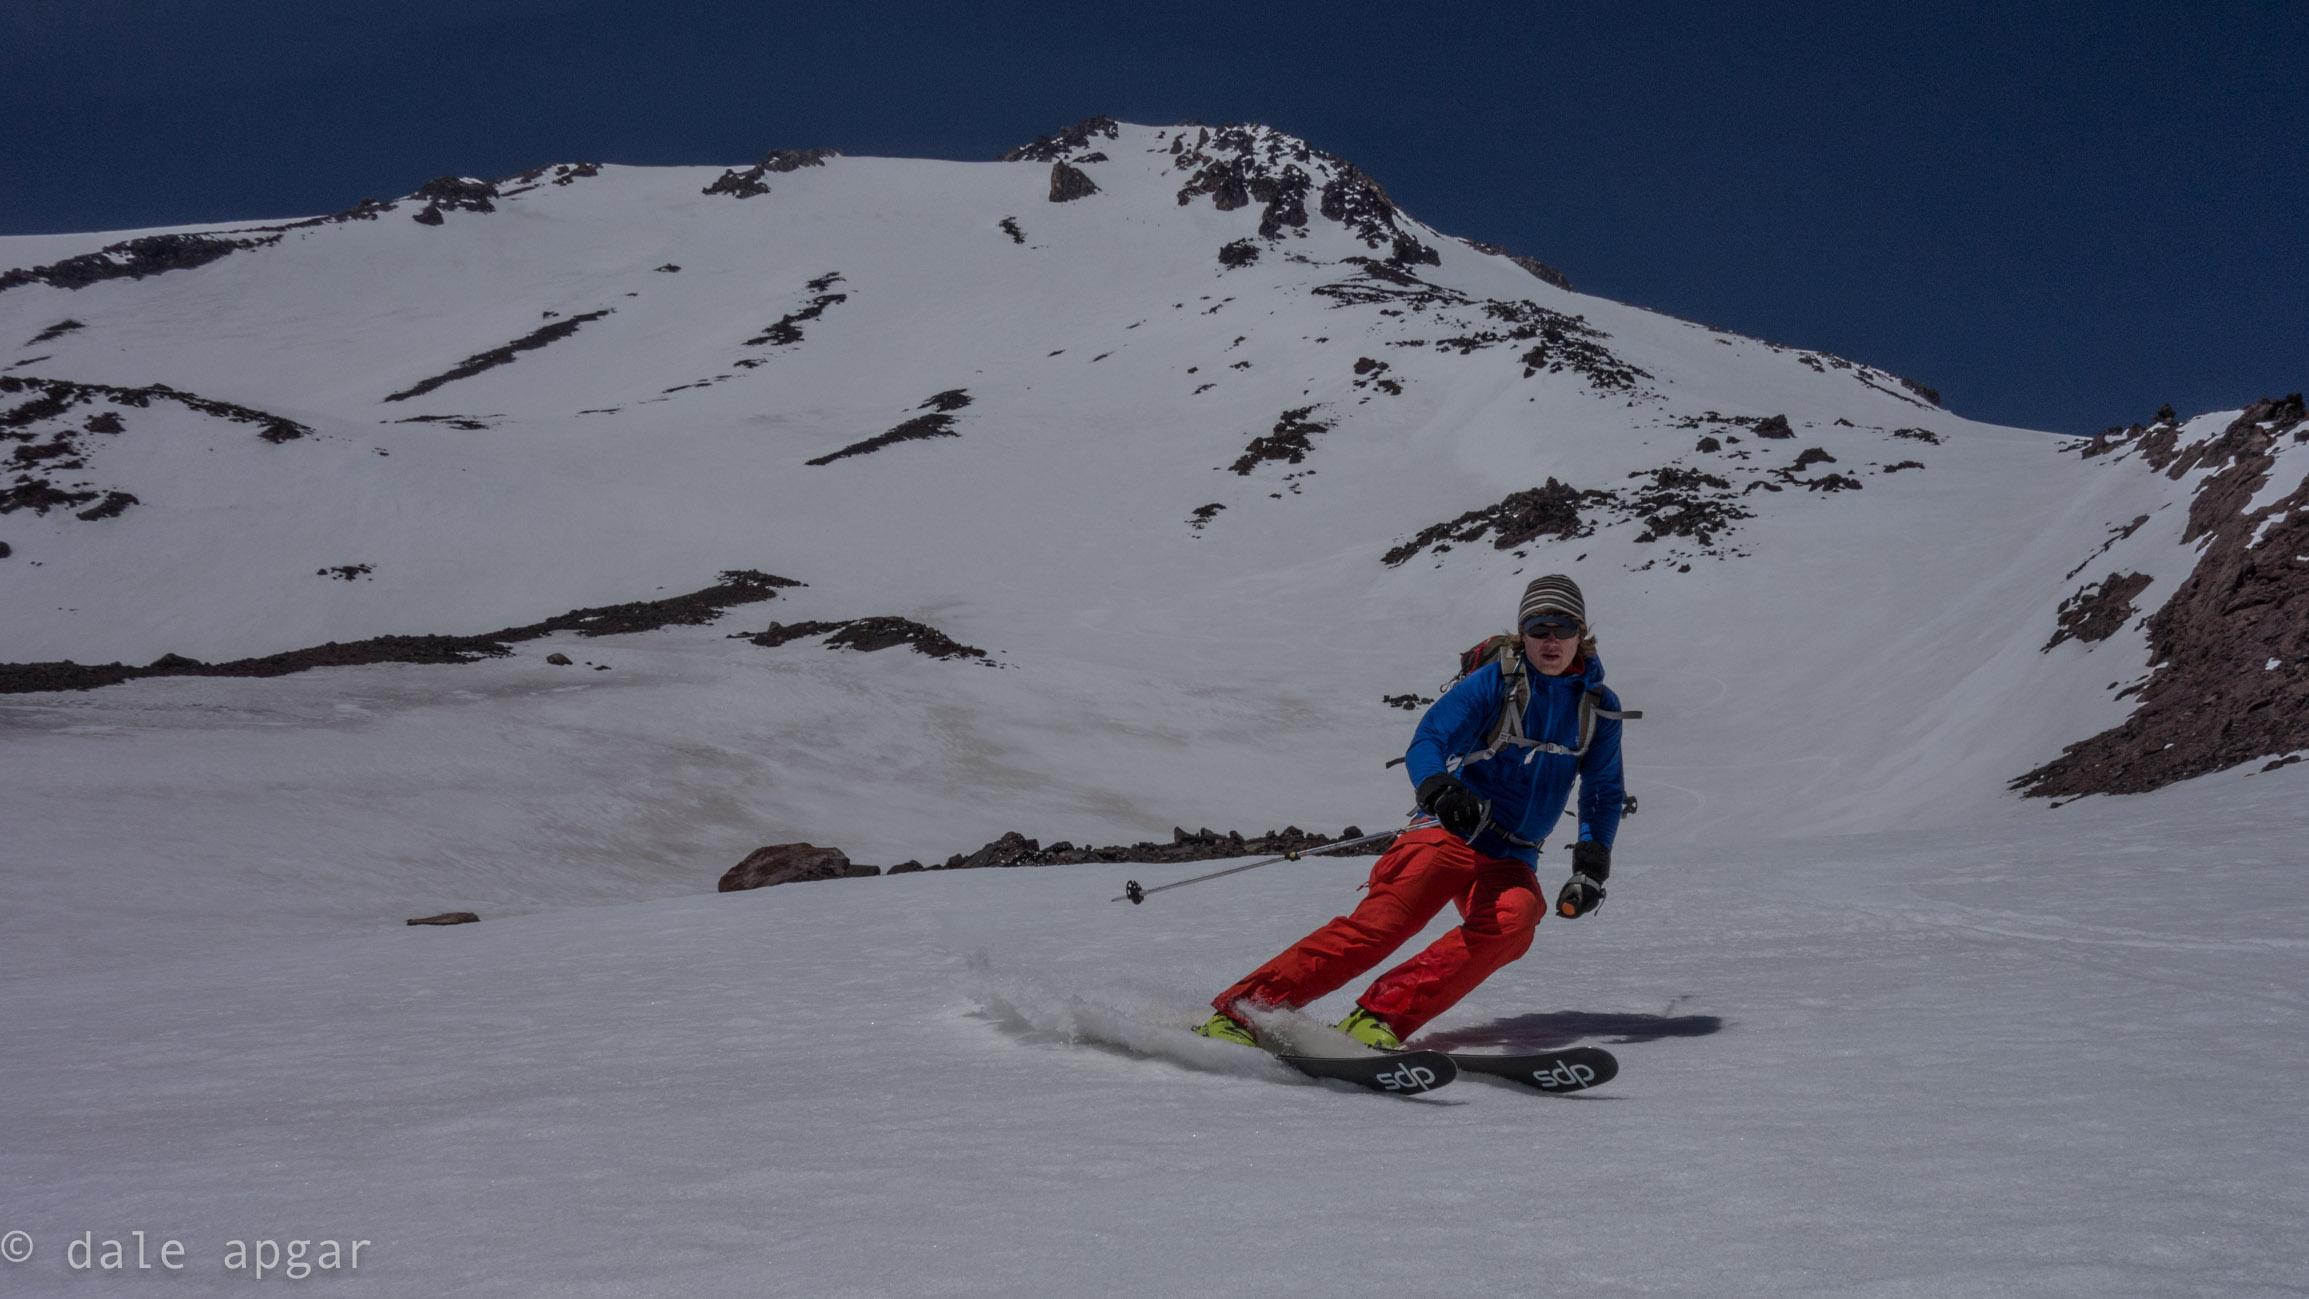 dale_apgar_ski-24.jpg